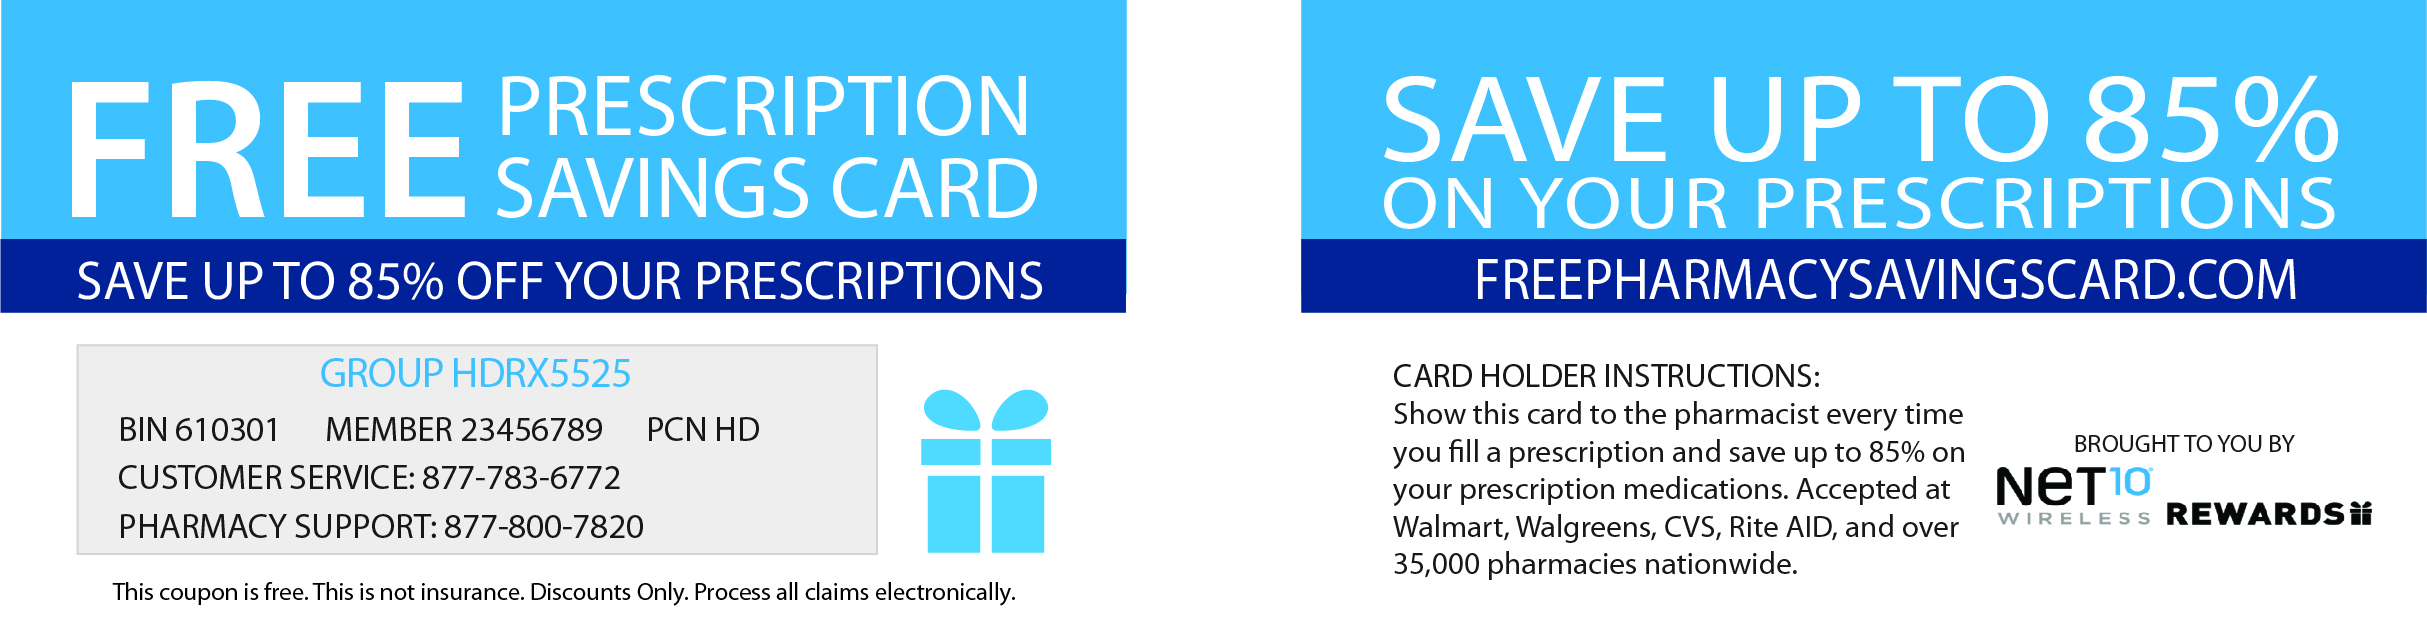 Net 10 Rewards > Prescription Savings Card